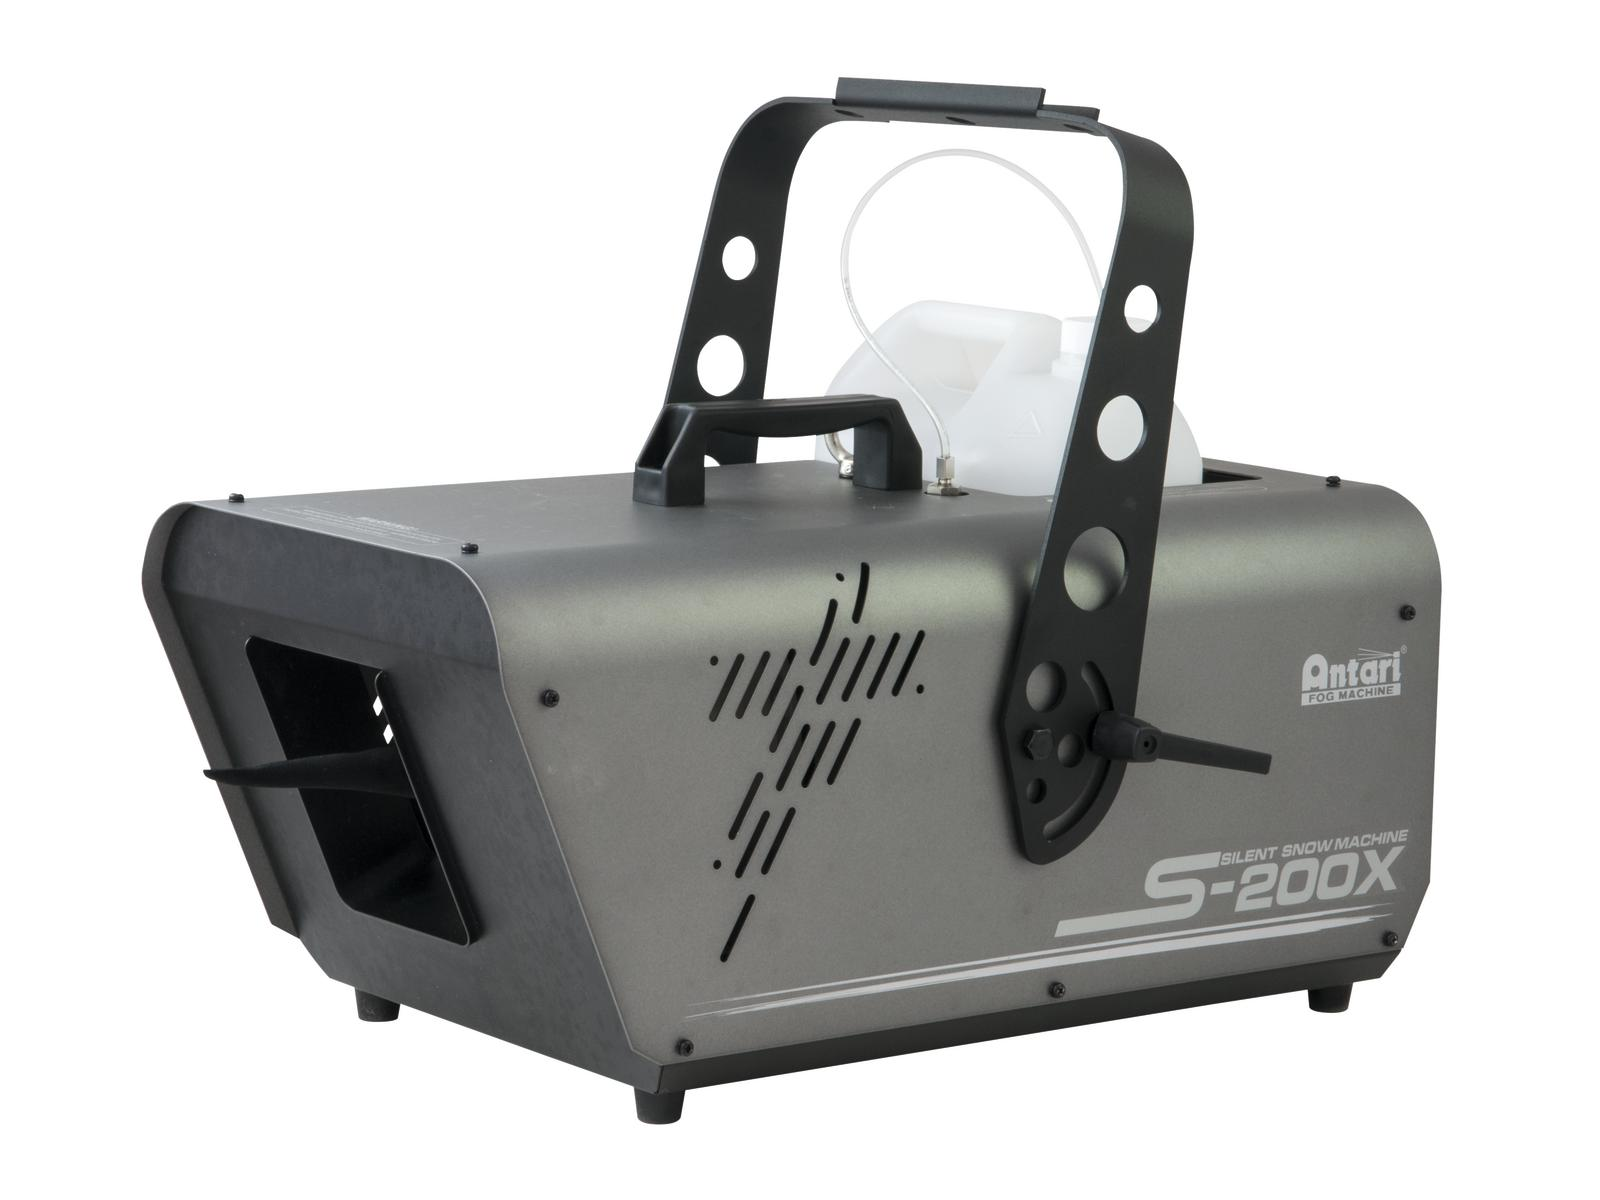 ANTARI S-200X geräuscharme Schneemaschine